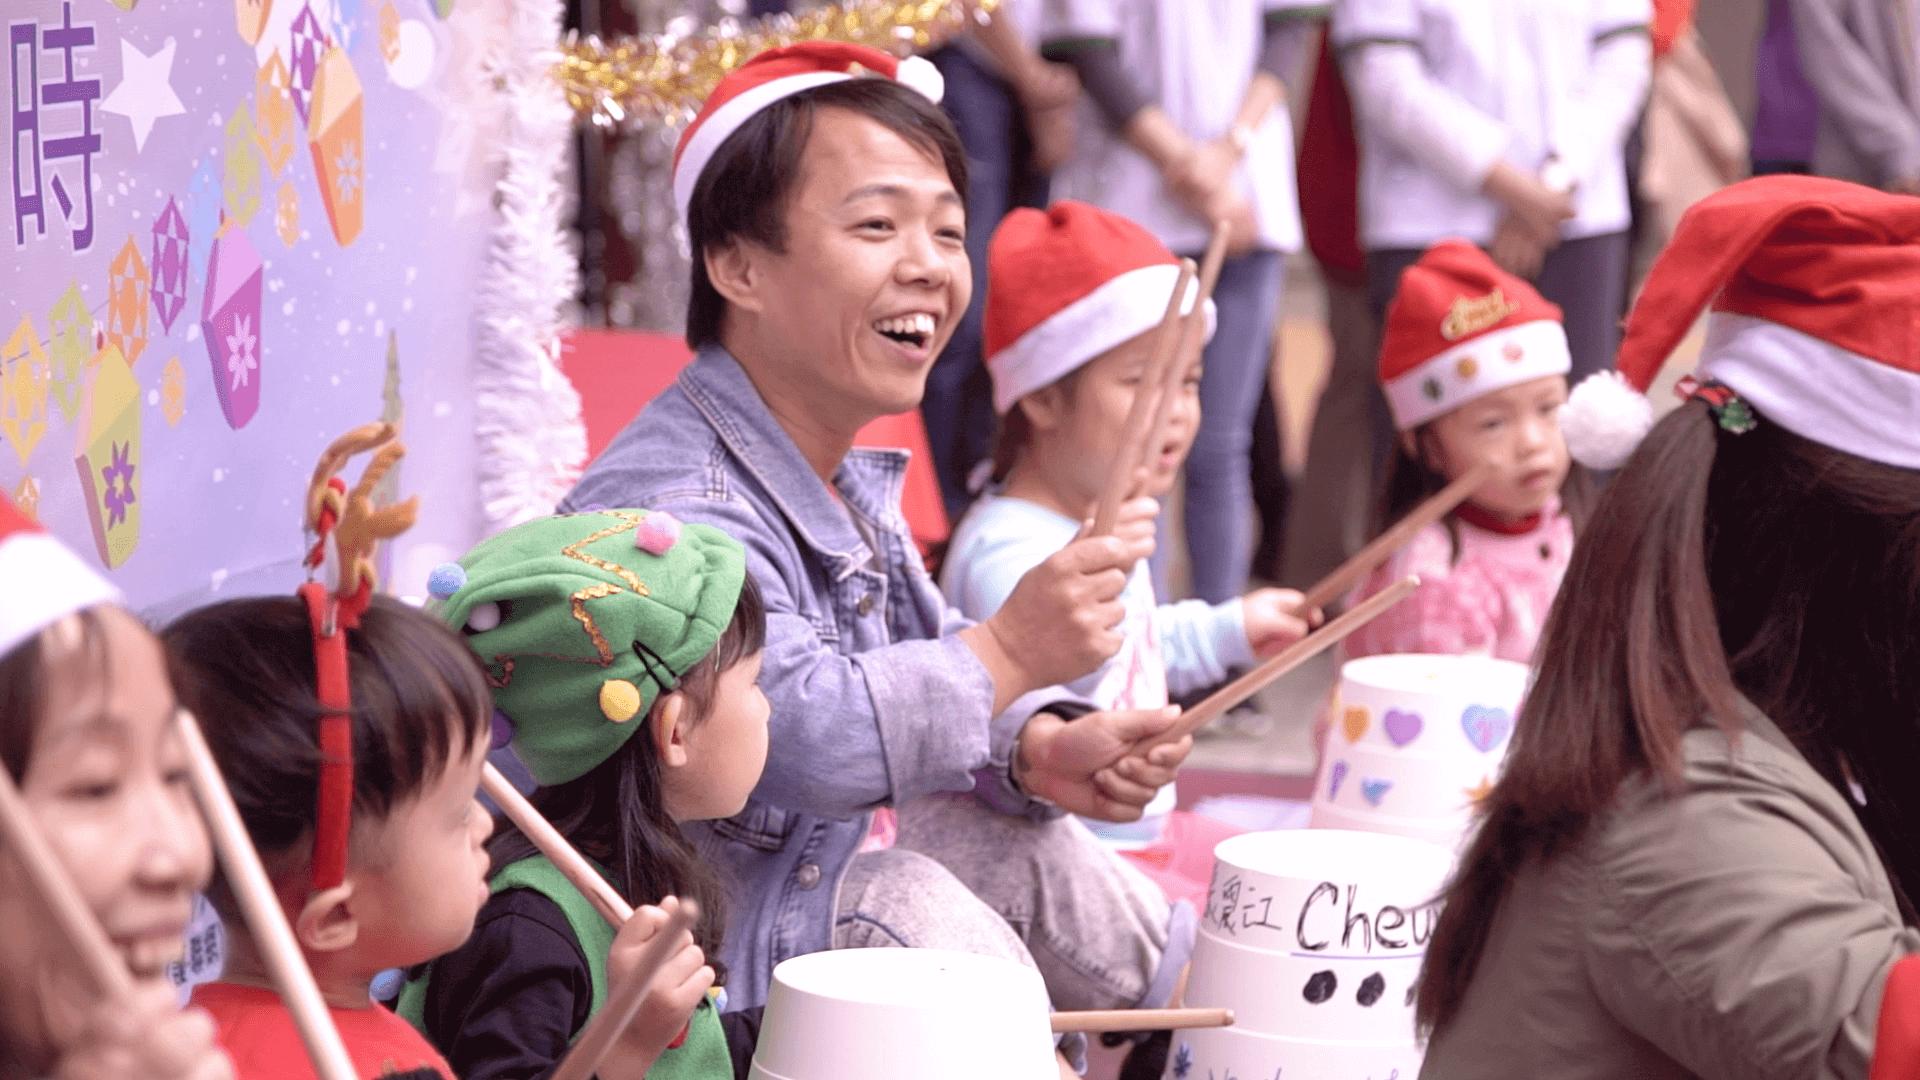 Little People Hong Kong